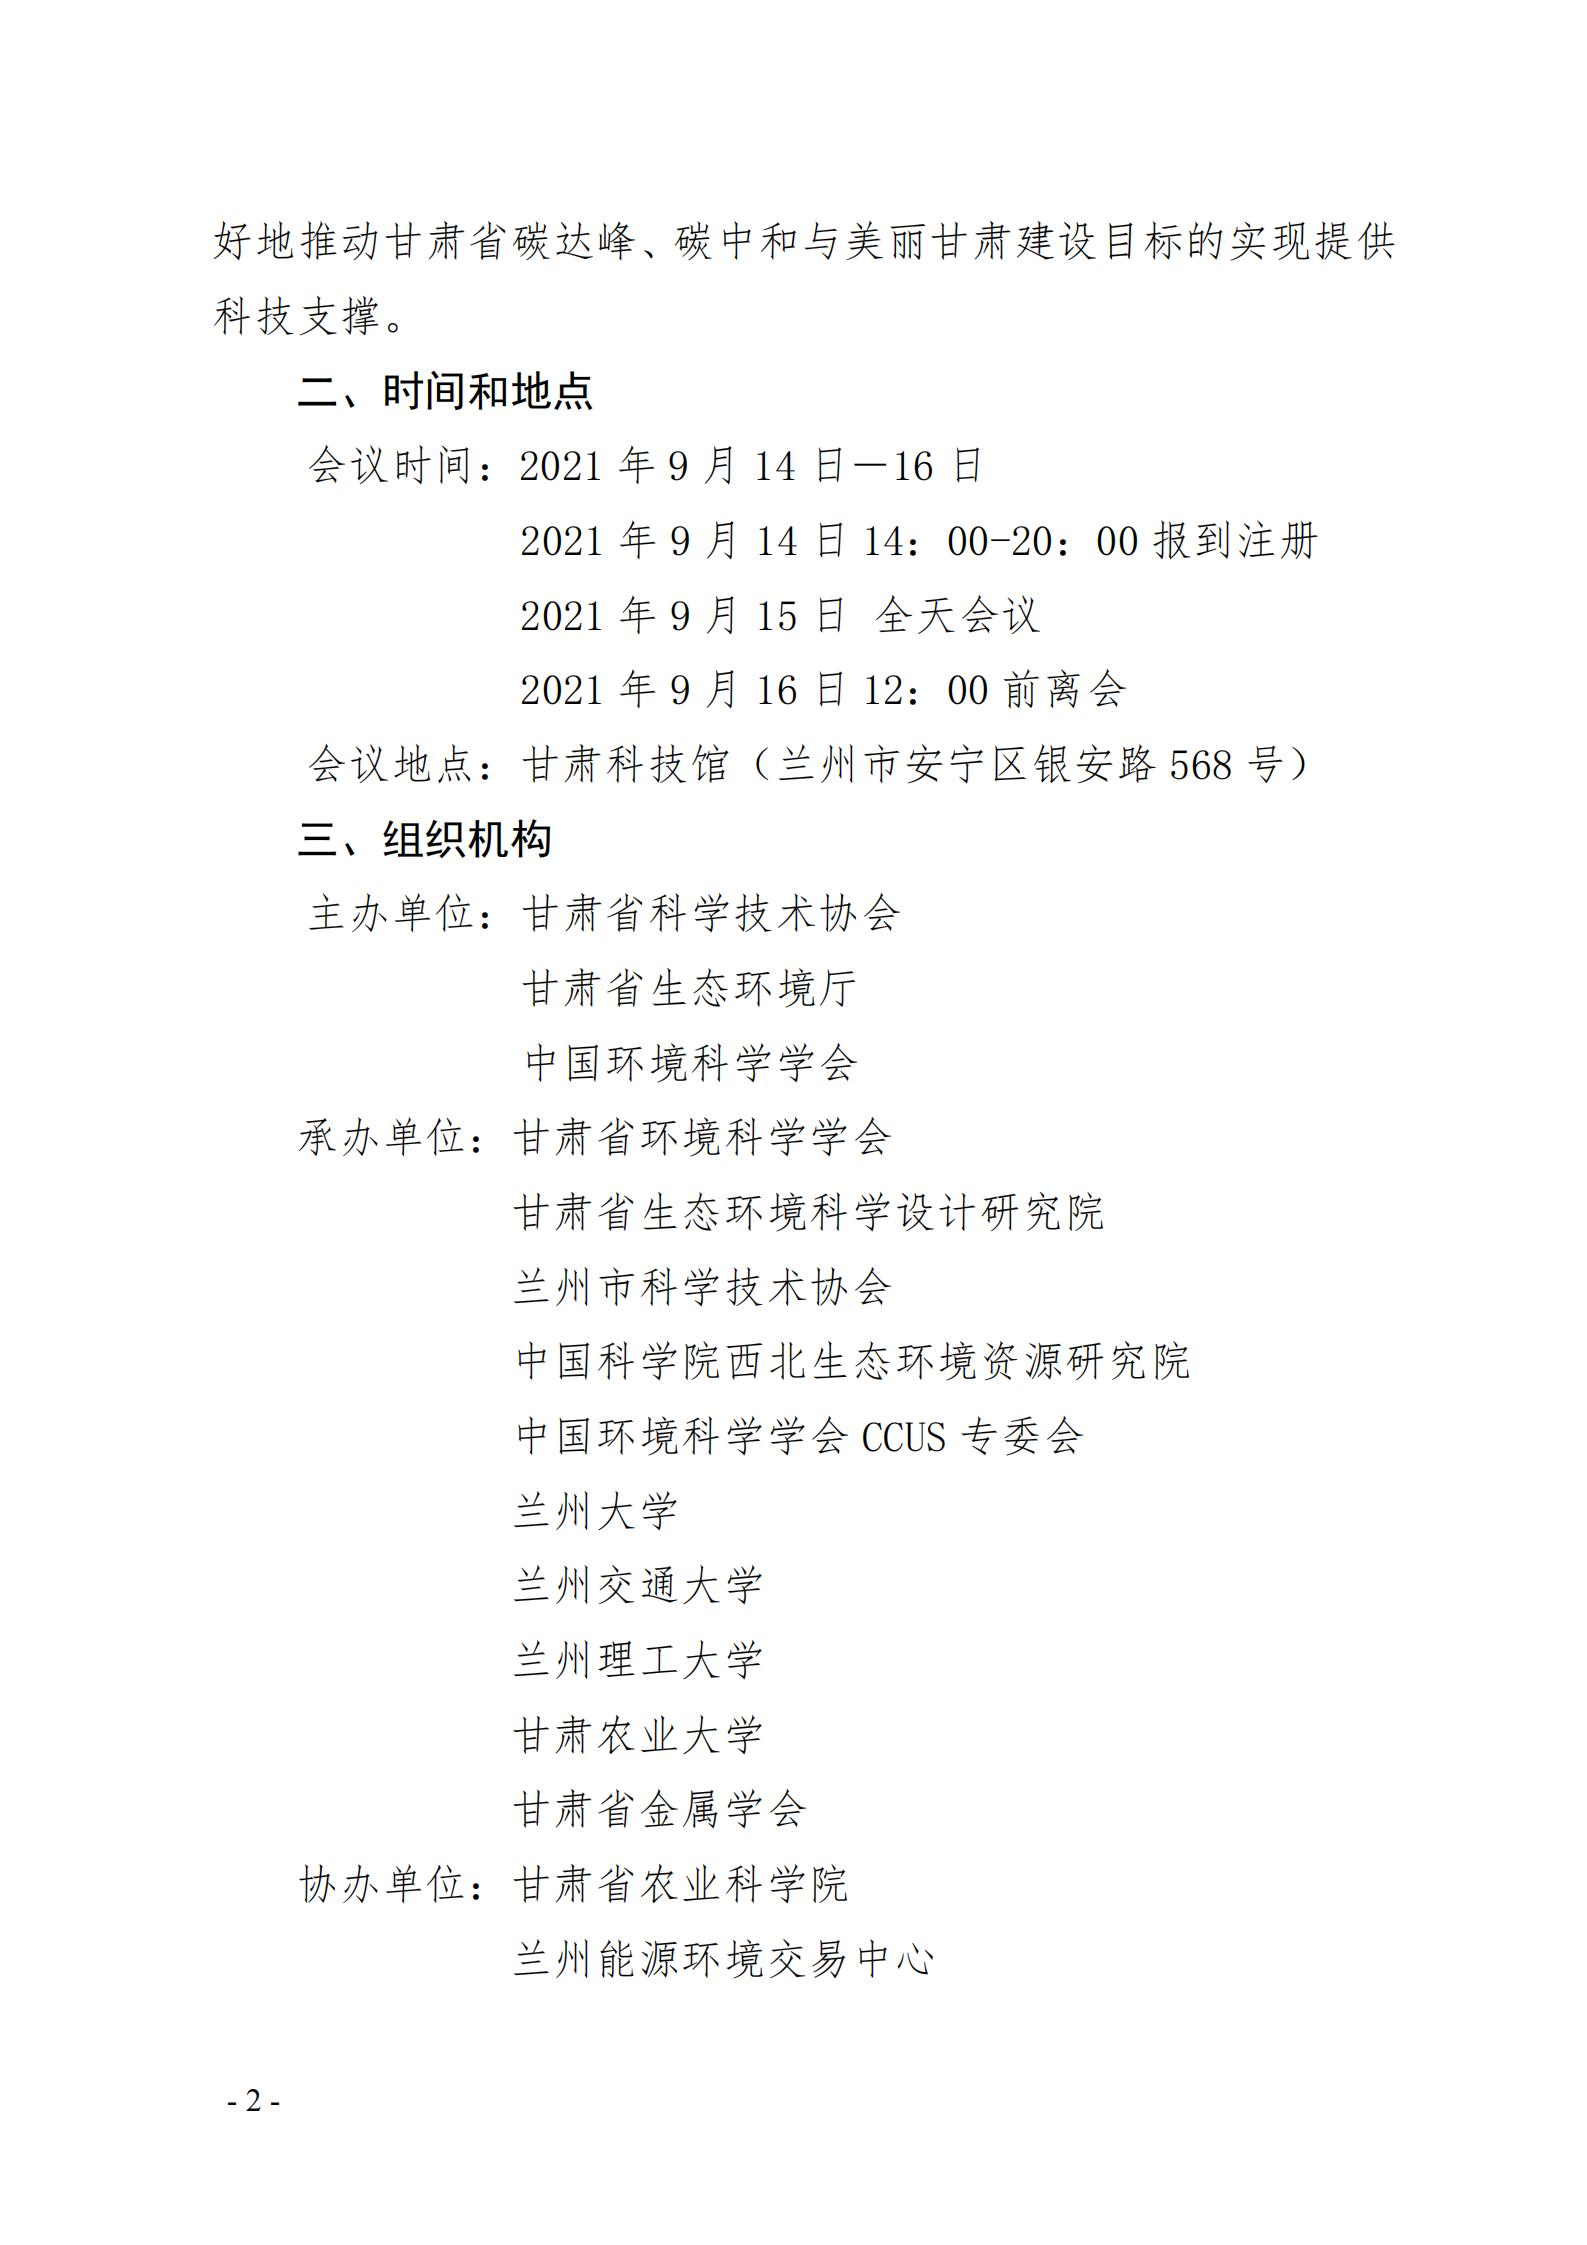 scan_00_01.jpg